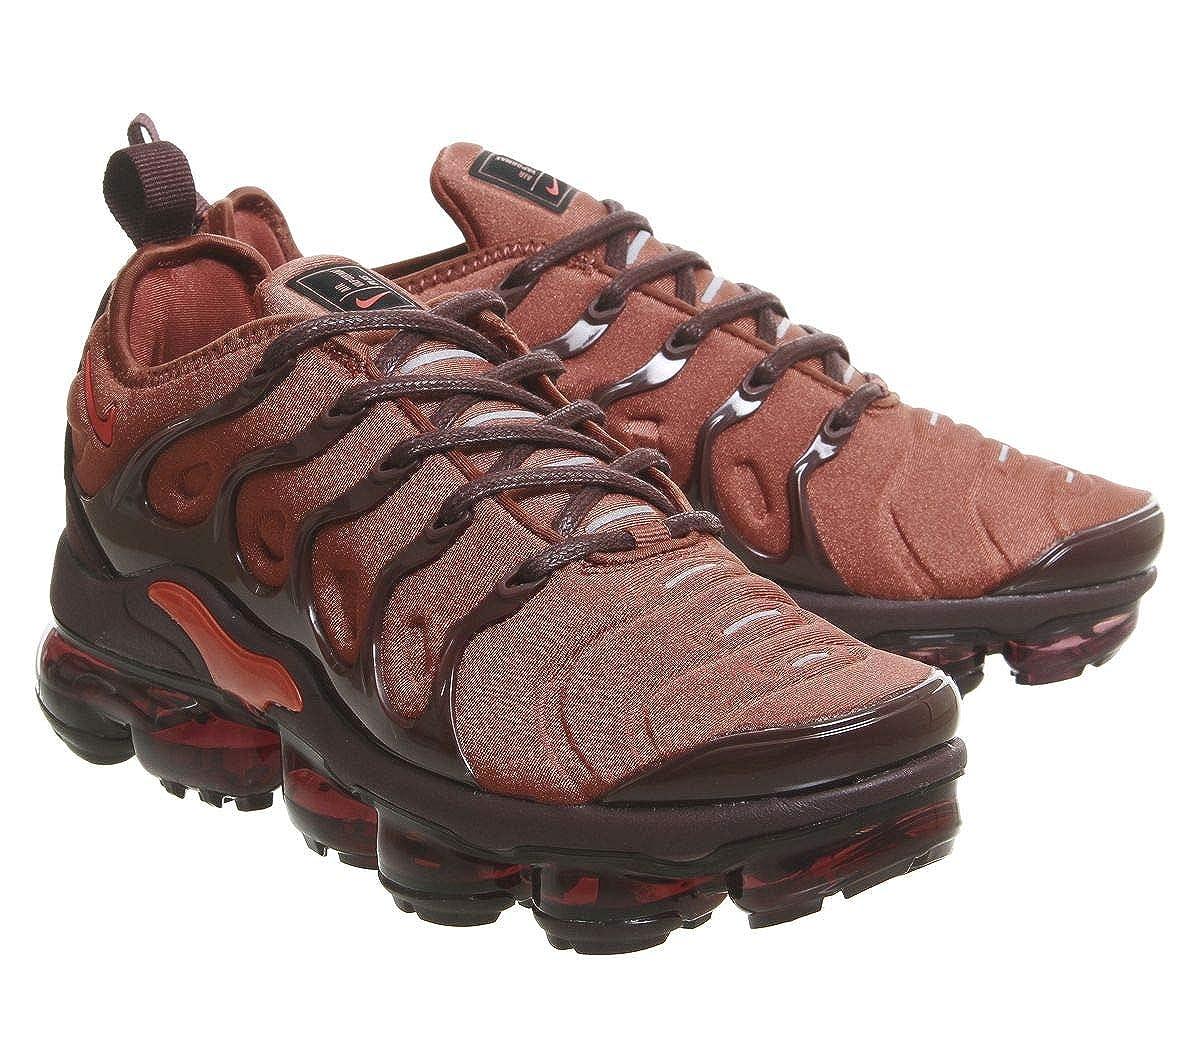 online store 771e6 721f2 Nike Women's W Air Vapormax Plus Fitness Shoes: Amazon.co.uk ...